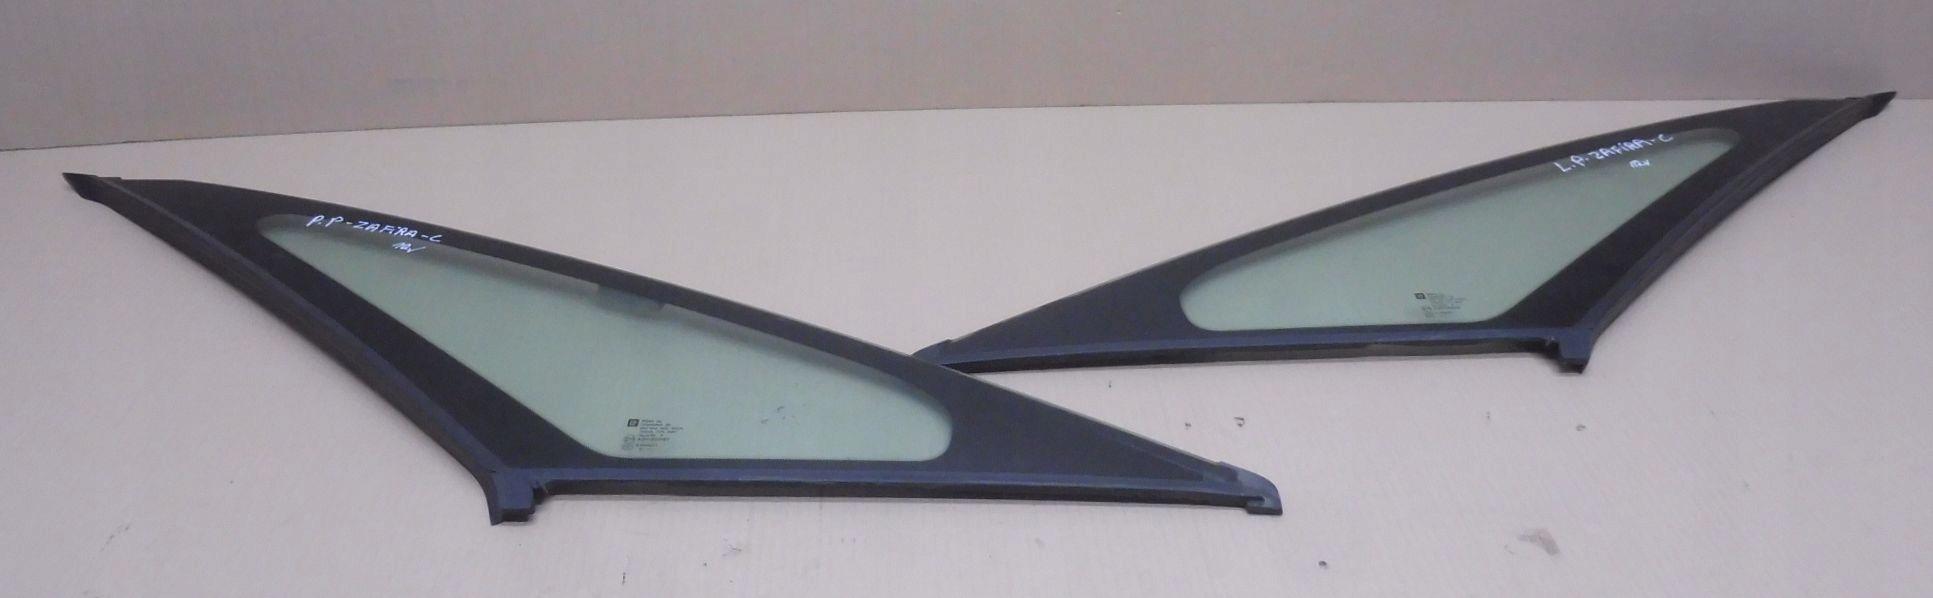 стекло karoseryjną вперед слева права opel zafira c